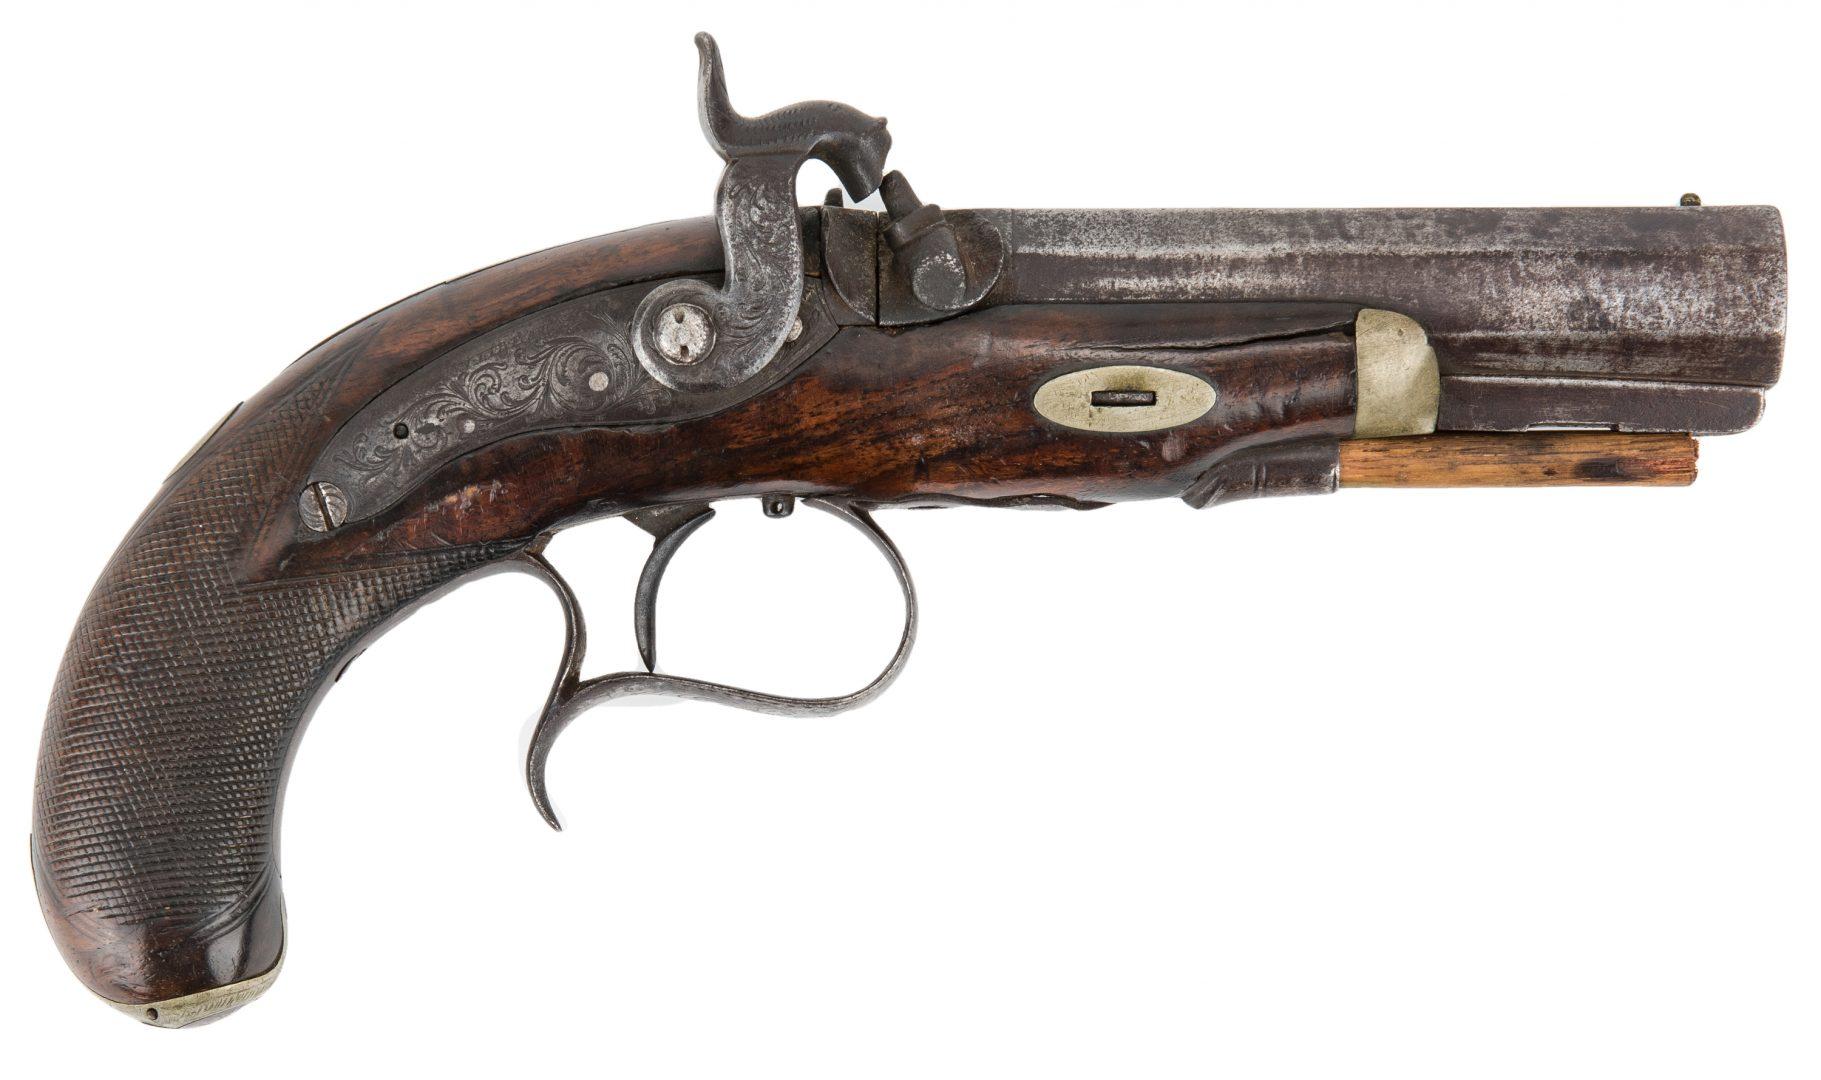 Lot 308: V. Libeau New Orleans Dealer Percussion Pocket Pistol, .54 Caliber